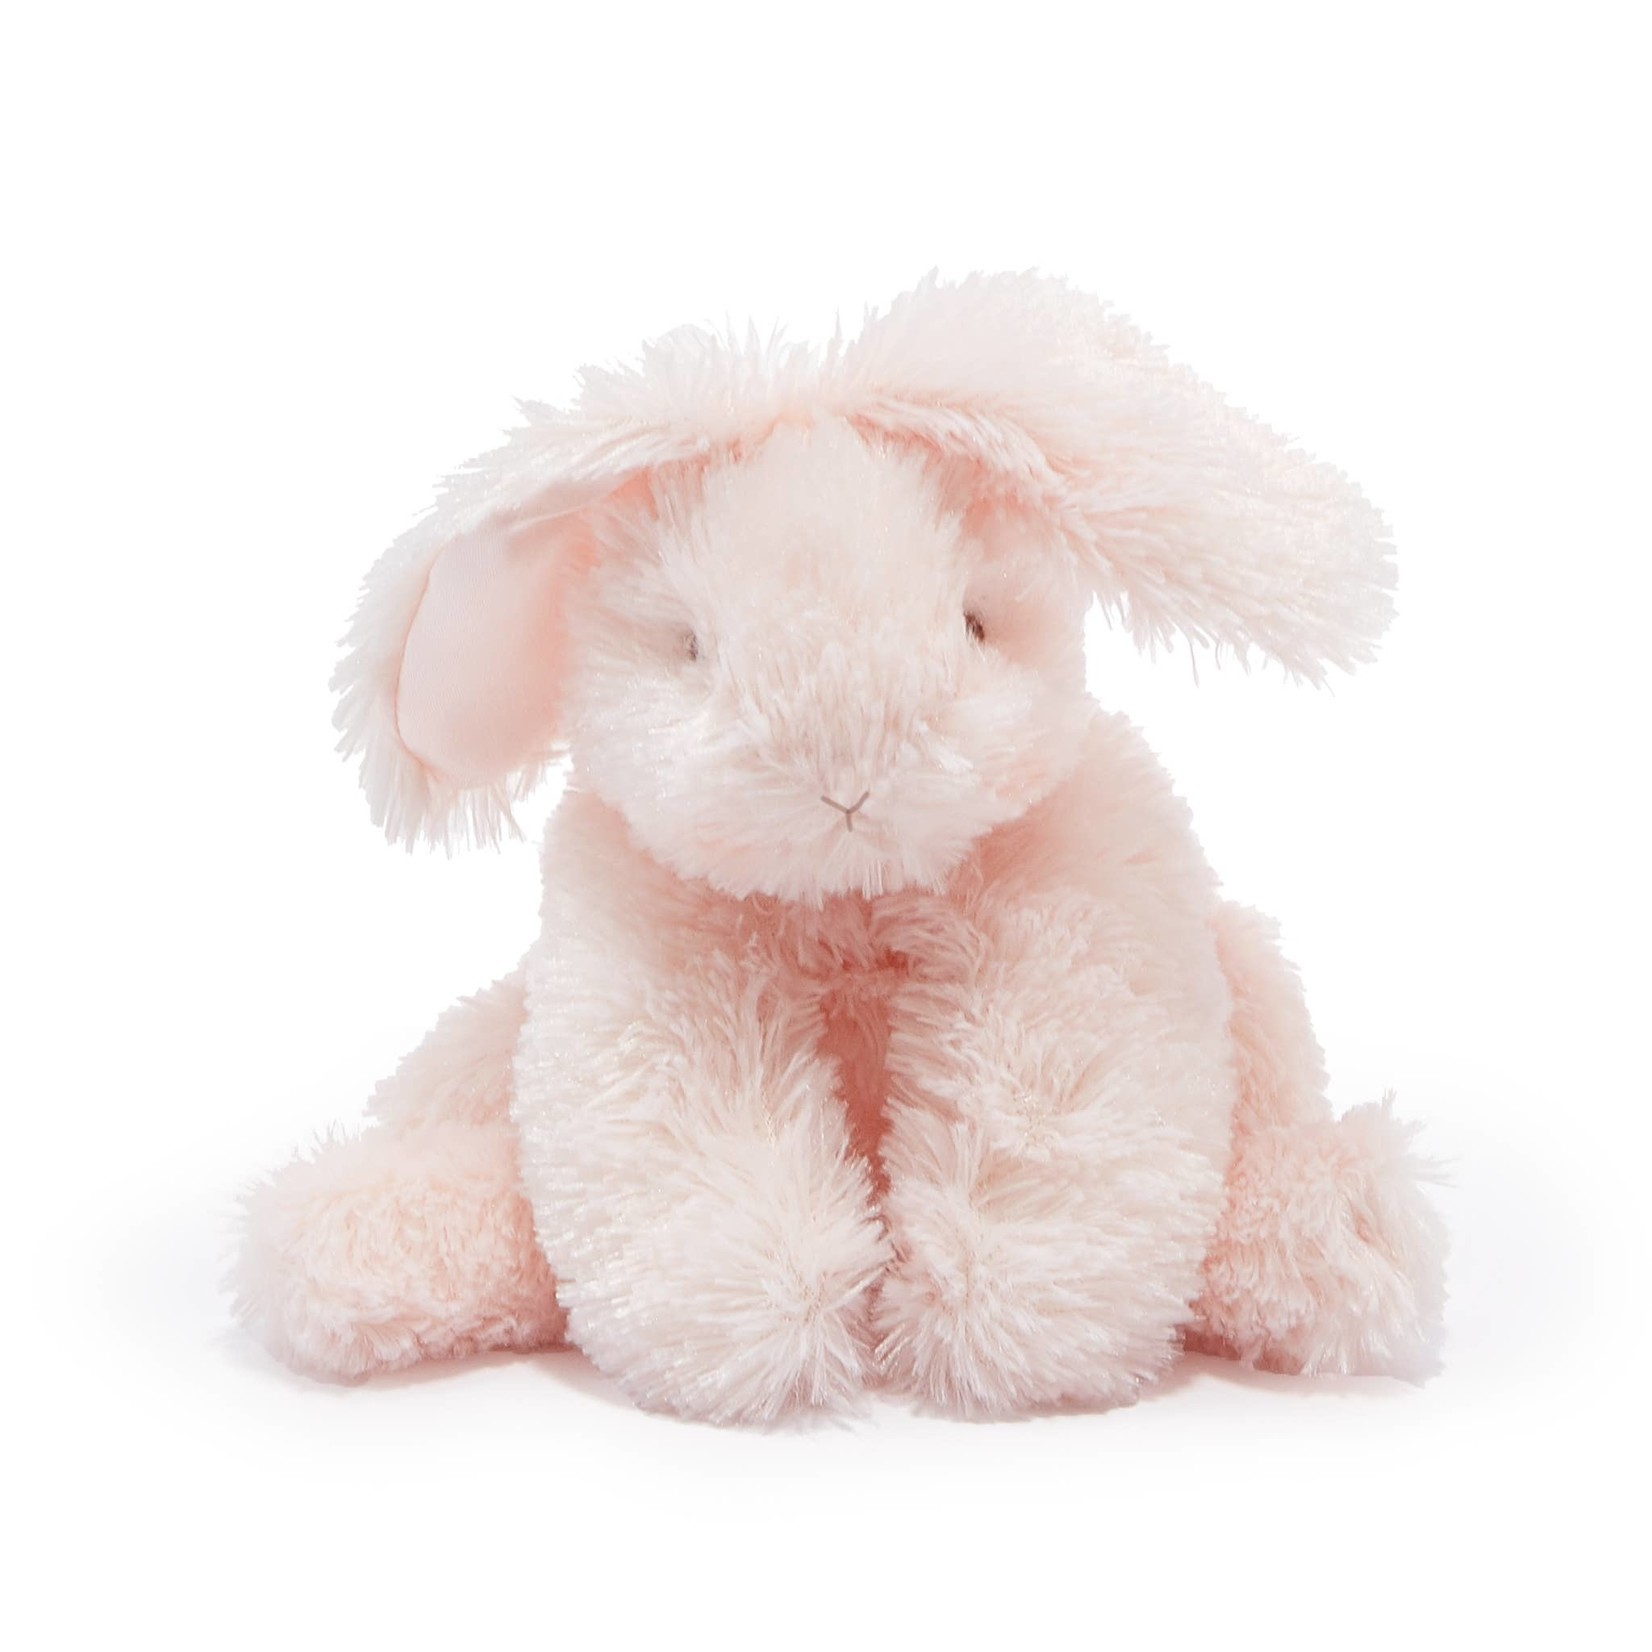 Bunnies By the Bay Blossom Floppy Bun Plush